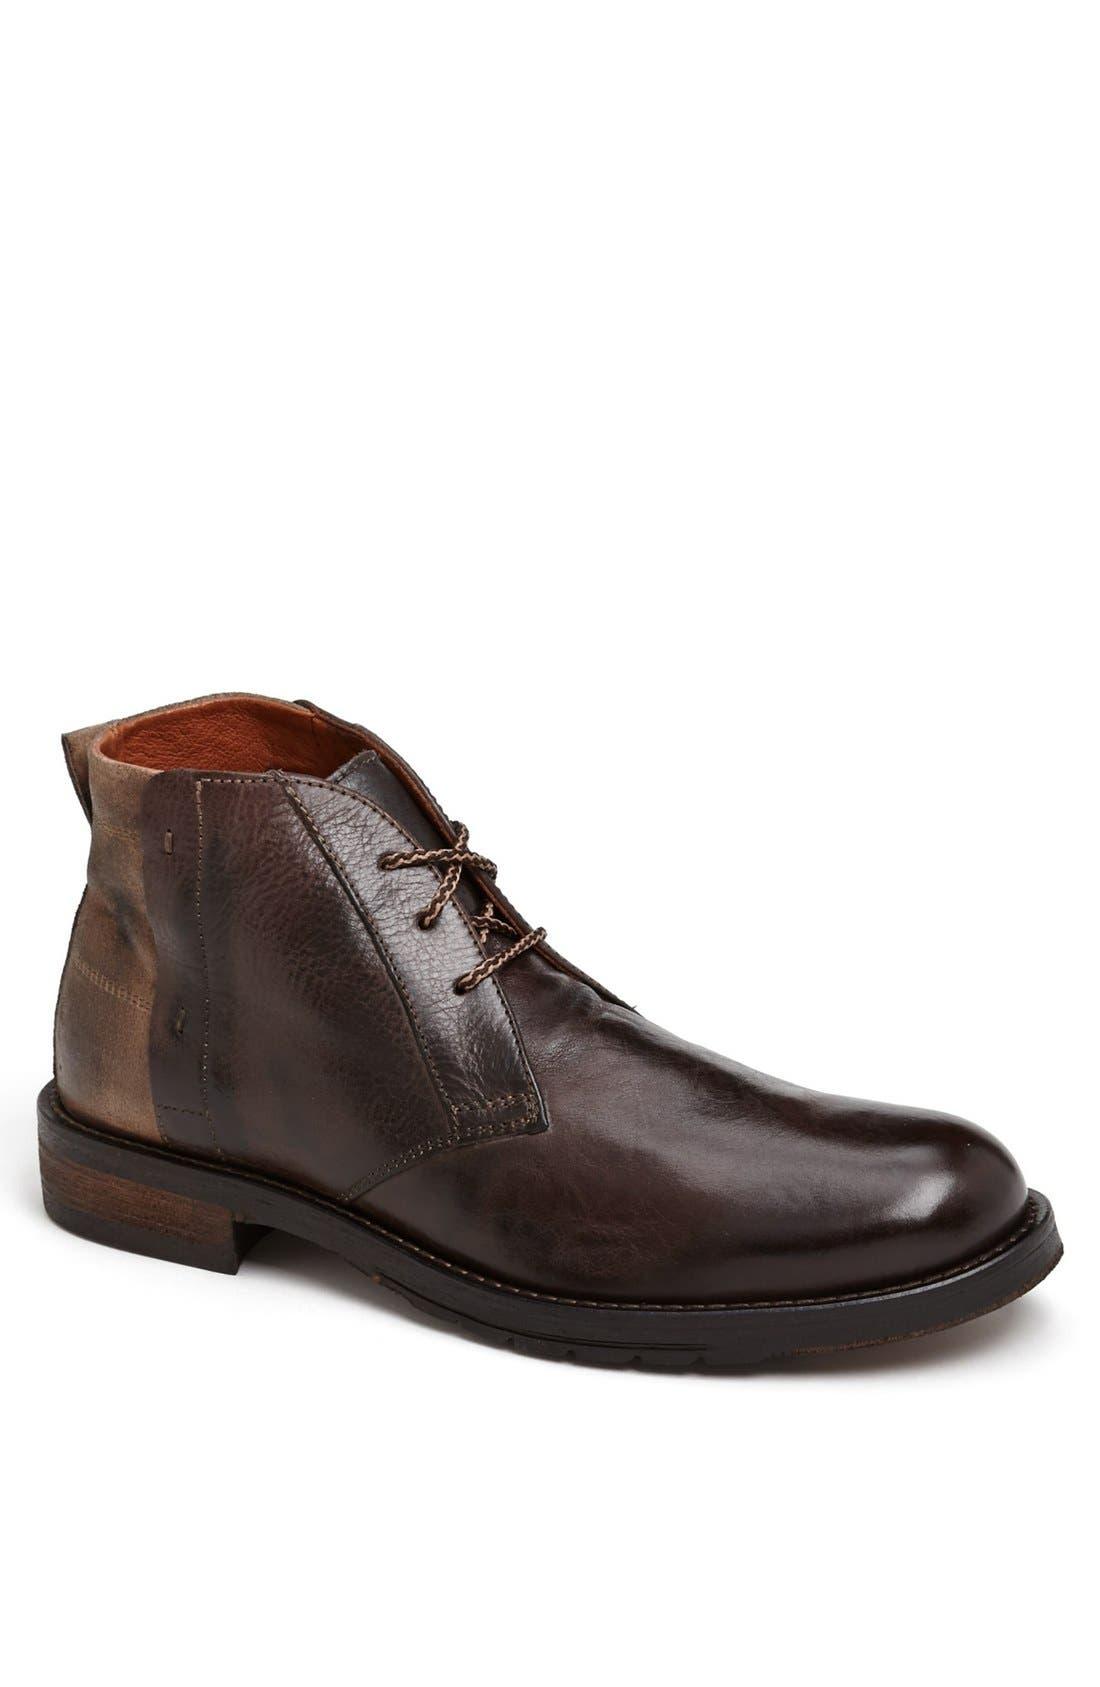 Alternate Image 1 Selected - J&M 1850 'Nordeman' Chukka Boot (Online Only)